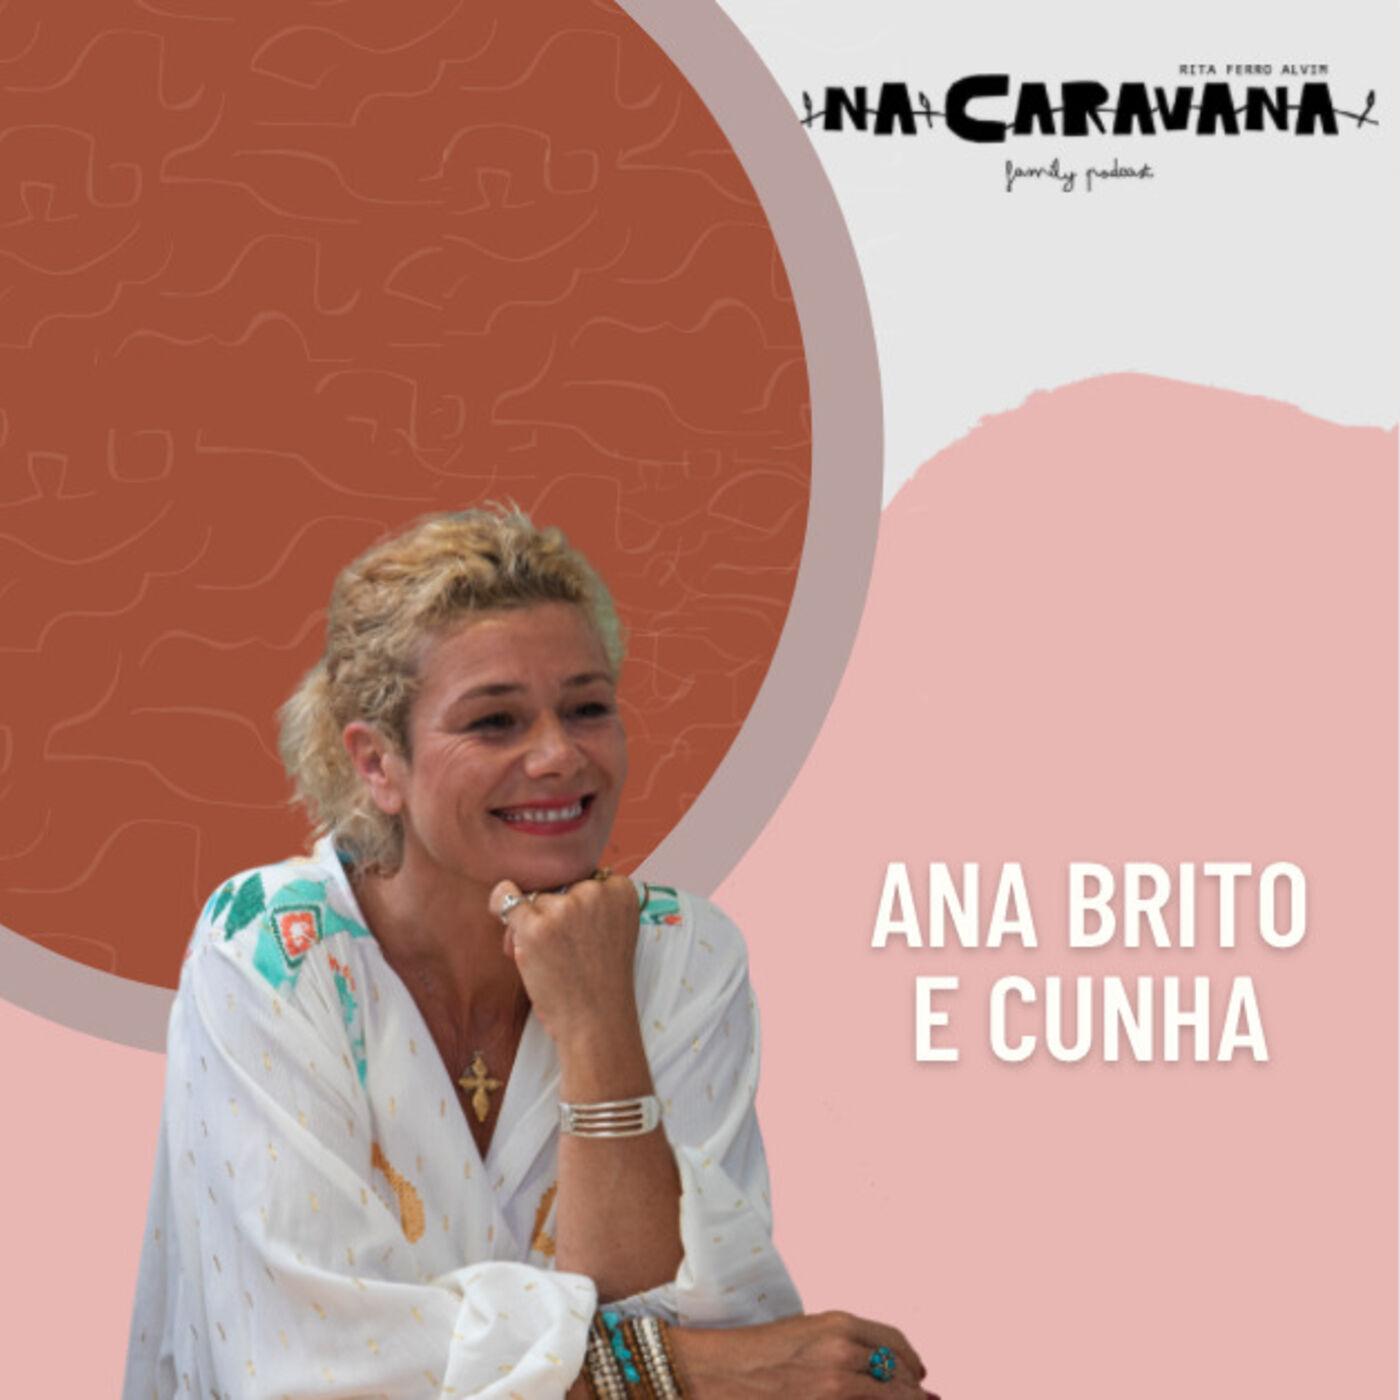 N'A Caravana com Ana Brito e Cunha #103 A carta, o luto e chorar como quem ri